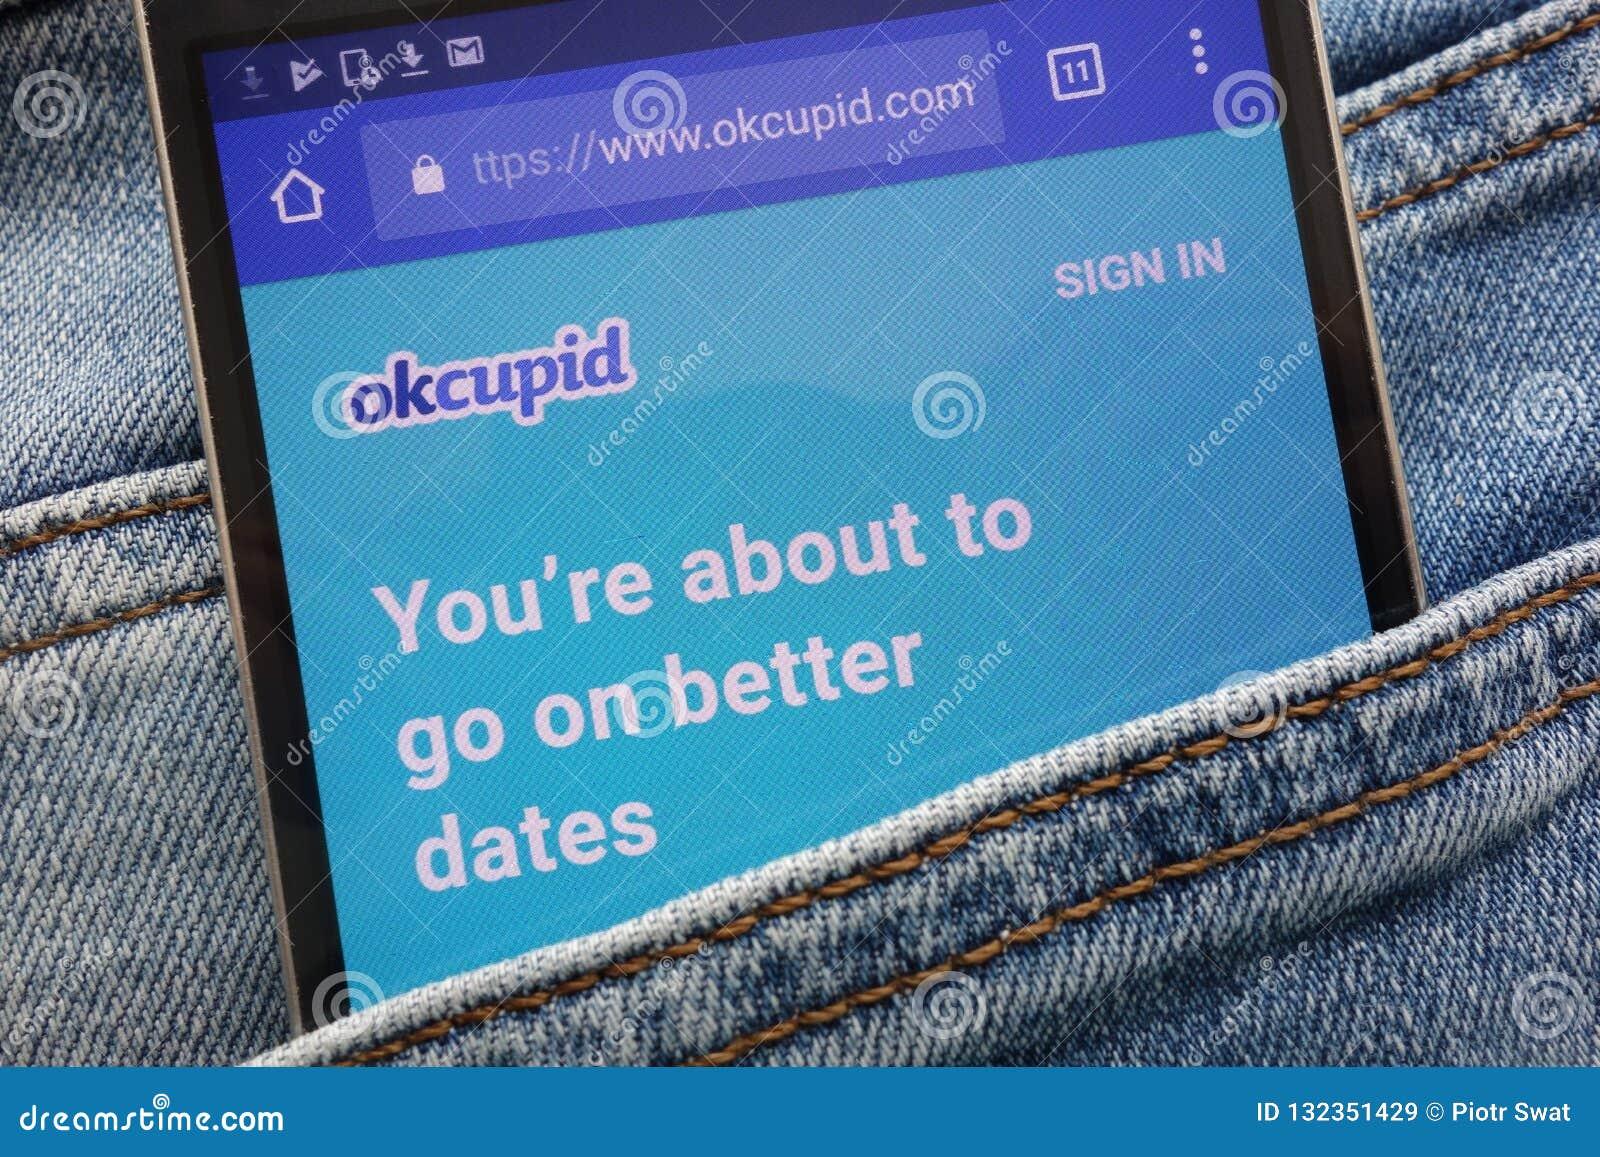 In sign okcupid com OkCupid Sign